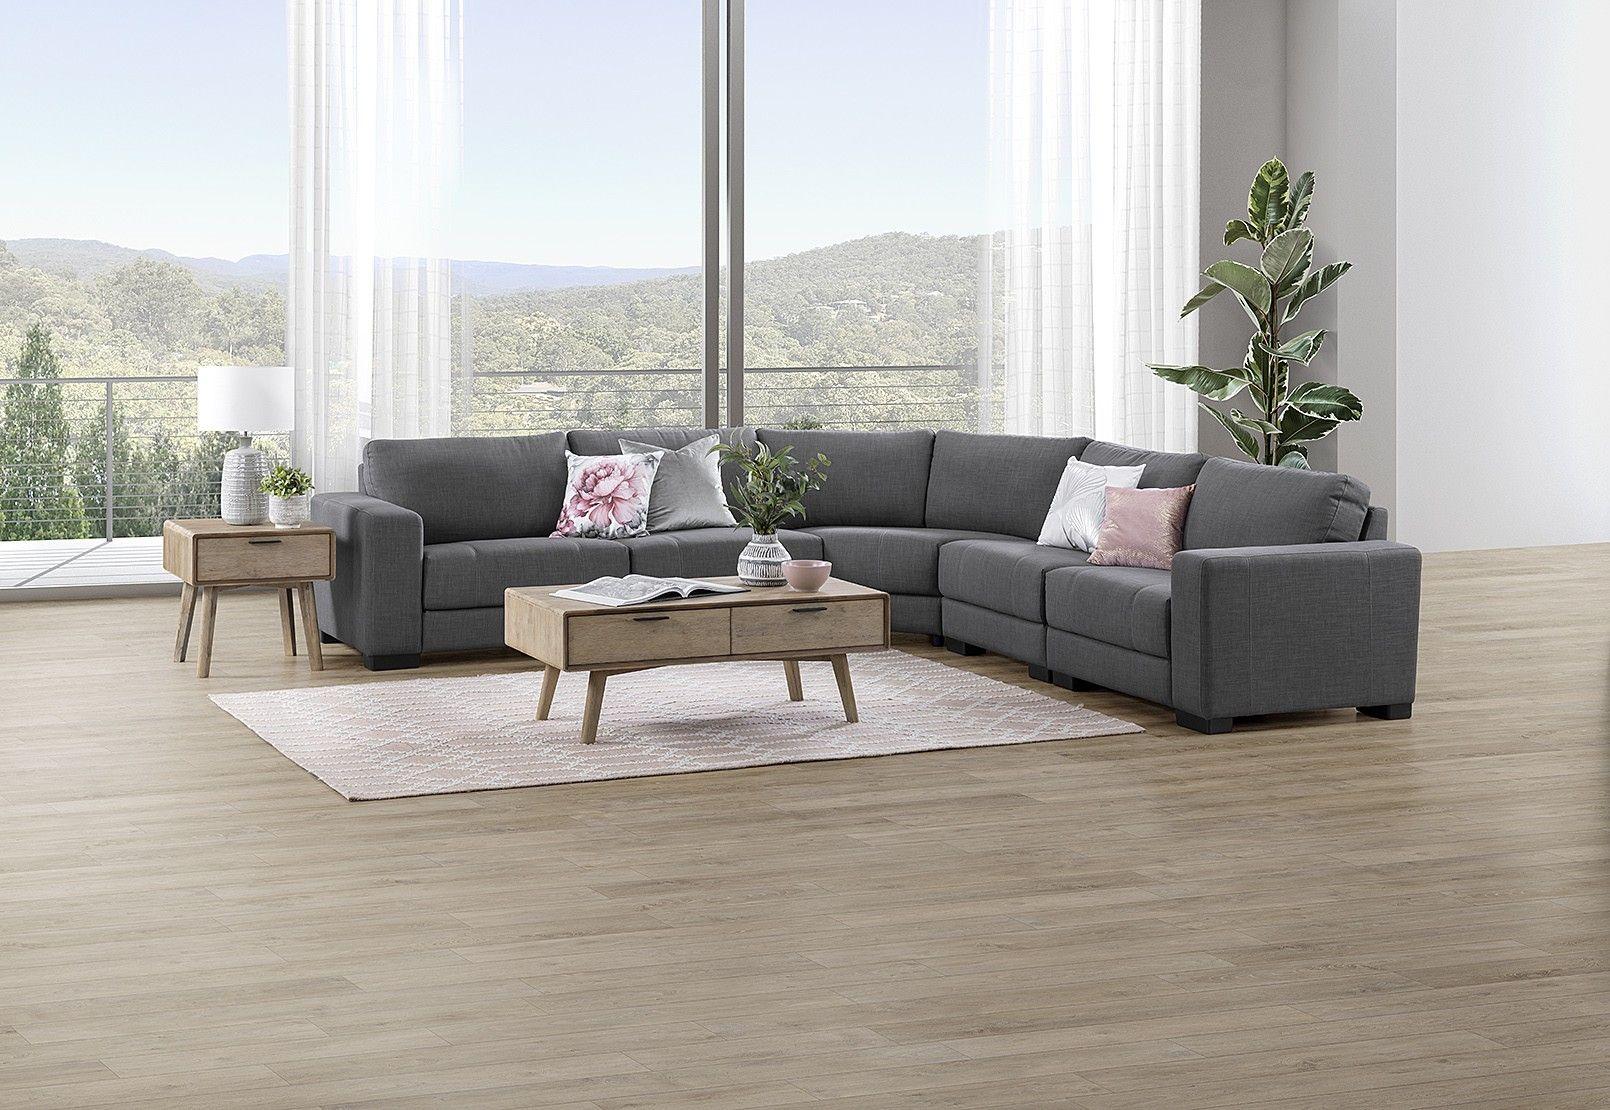 Omaha Fabric Corner Lounge Amart Furniture Furniture Lounge Home Decor